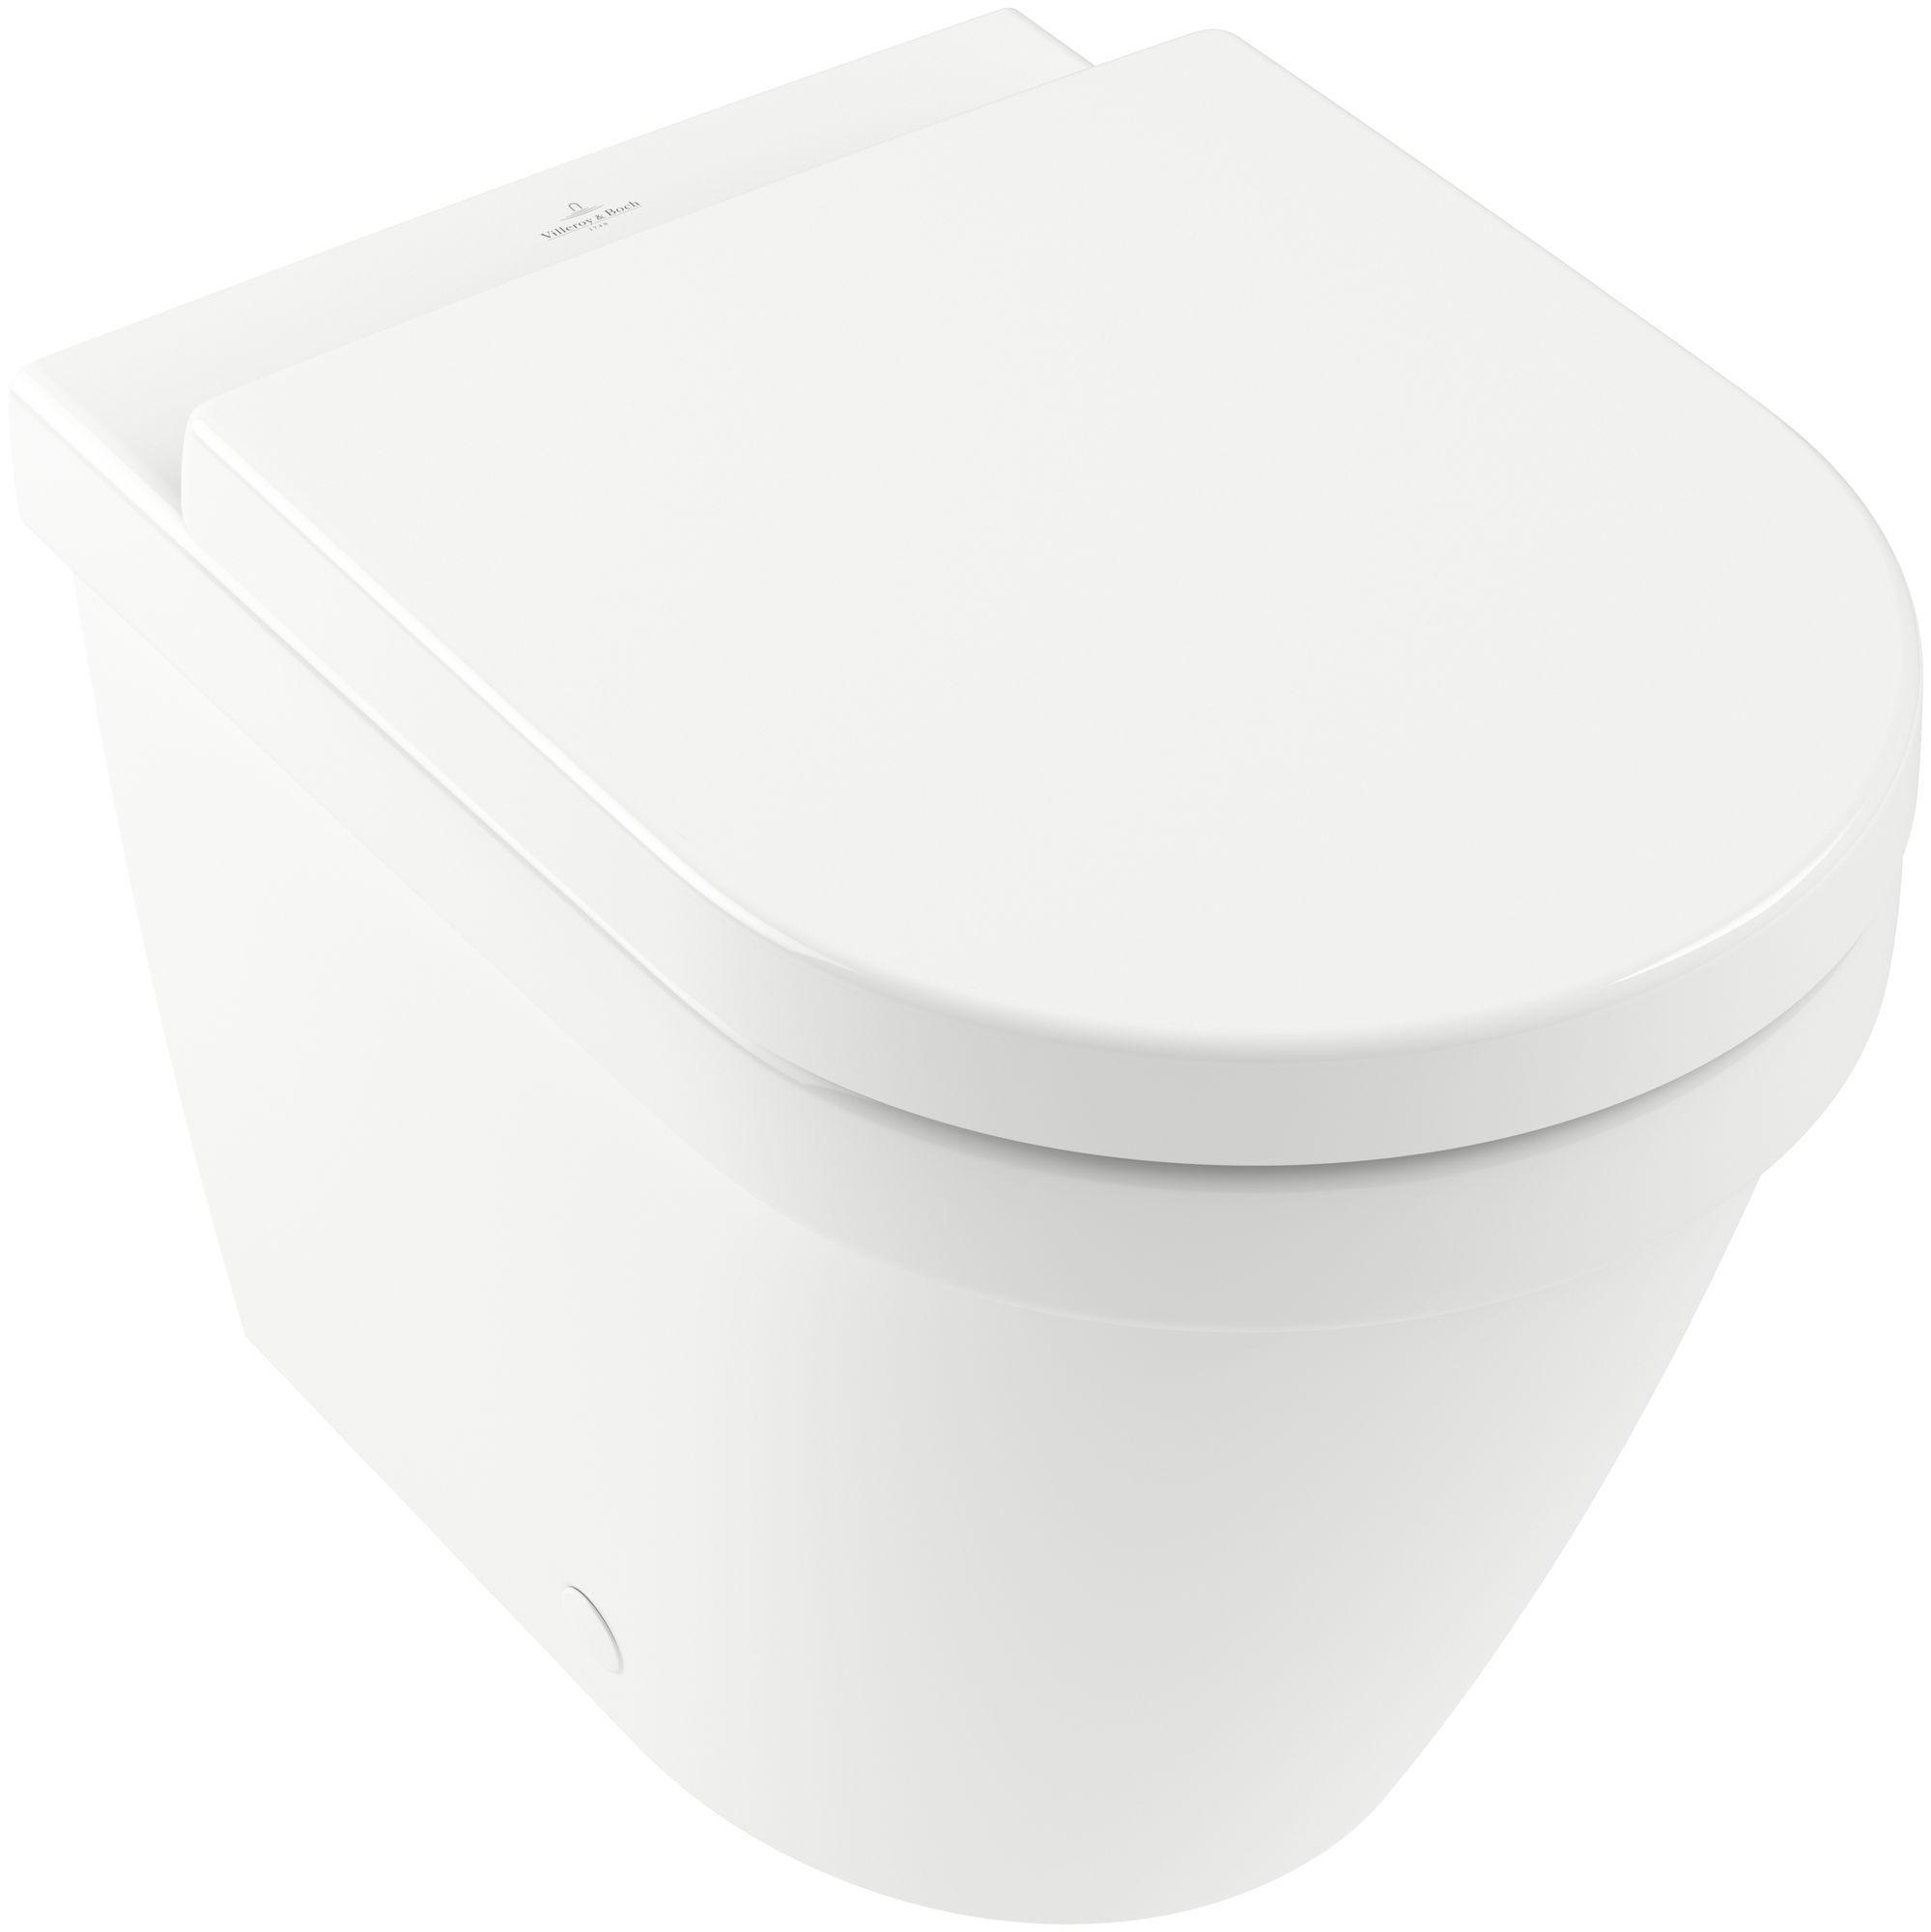 Villeroy & Boch Architectura Stand-Tiefspül-WC B:37xT:54cm DirectFlush mit offenem Spülrand wandnah weiß 5690R001